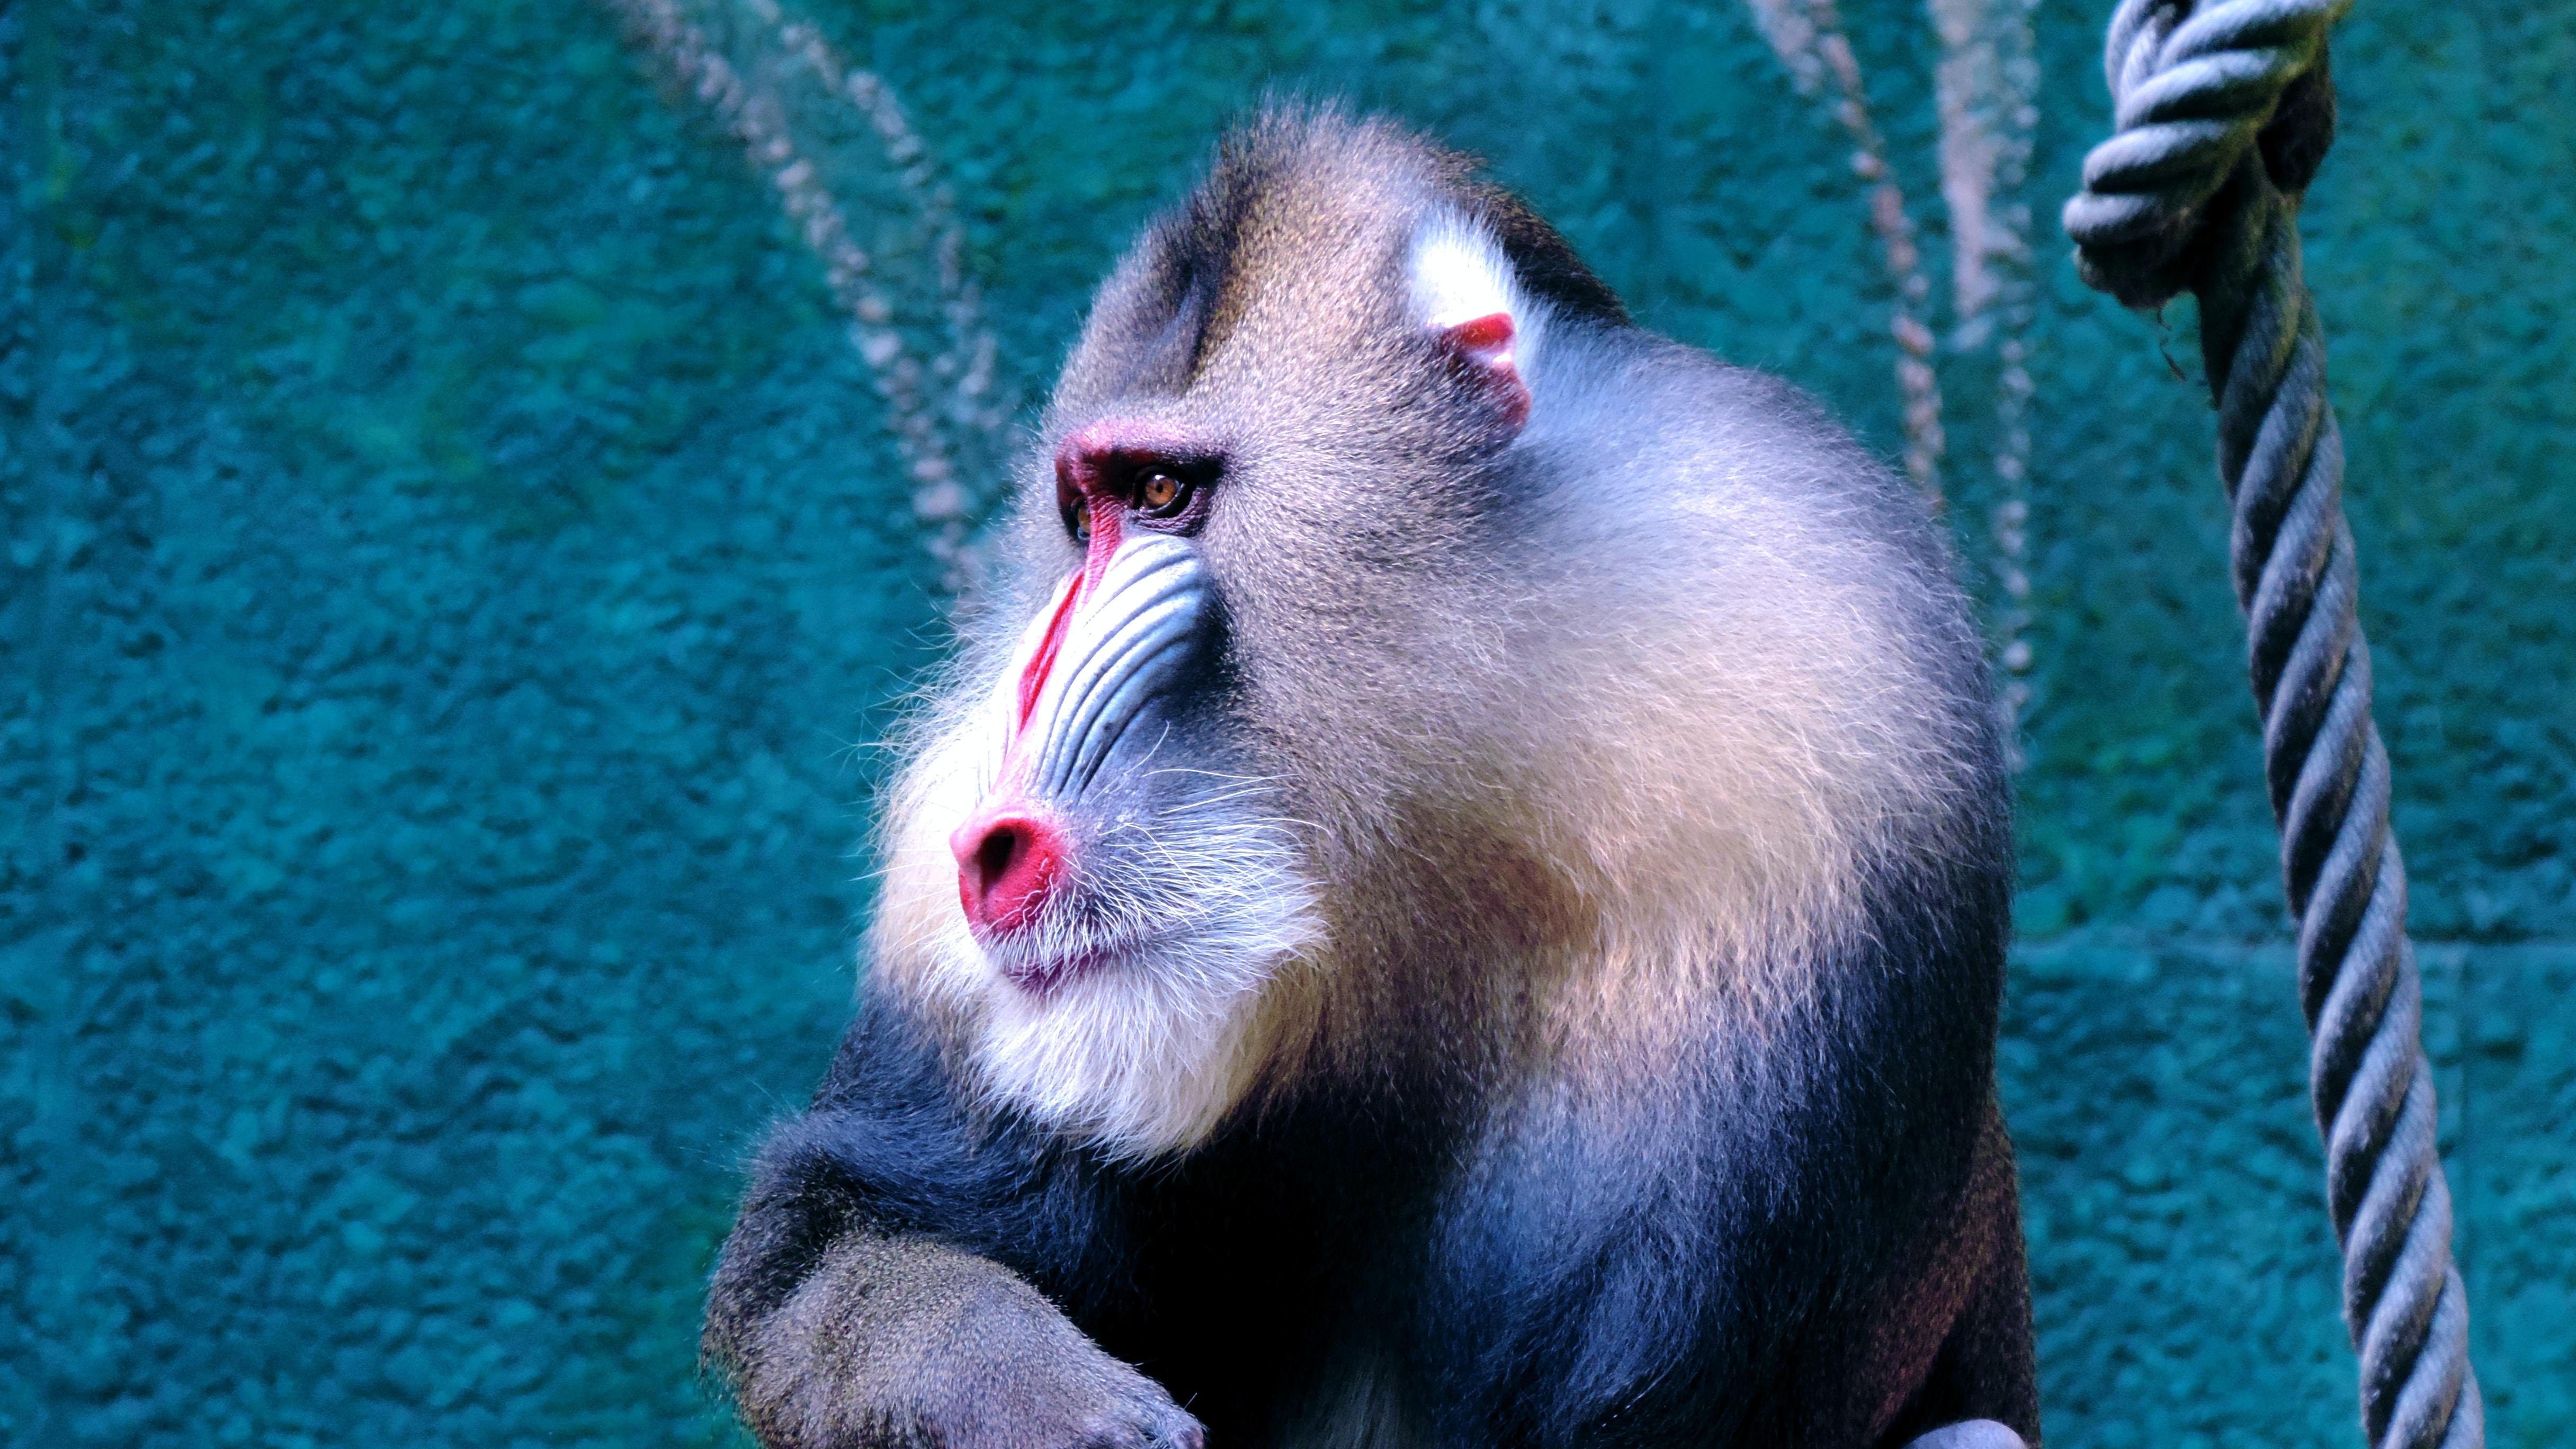 Baboon sitting beside green wall